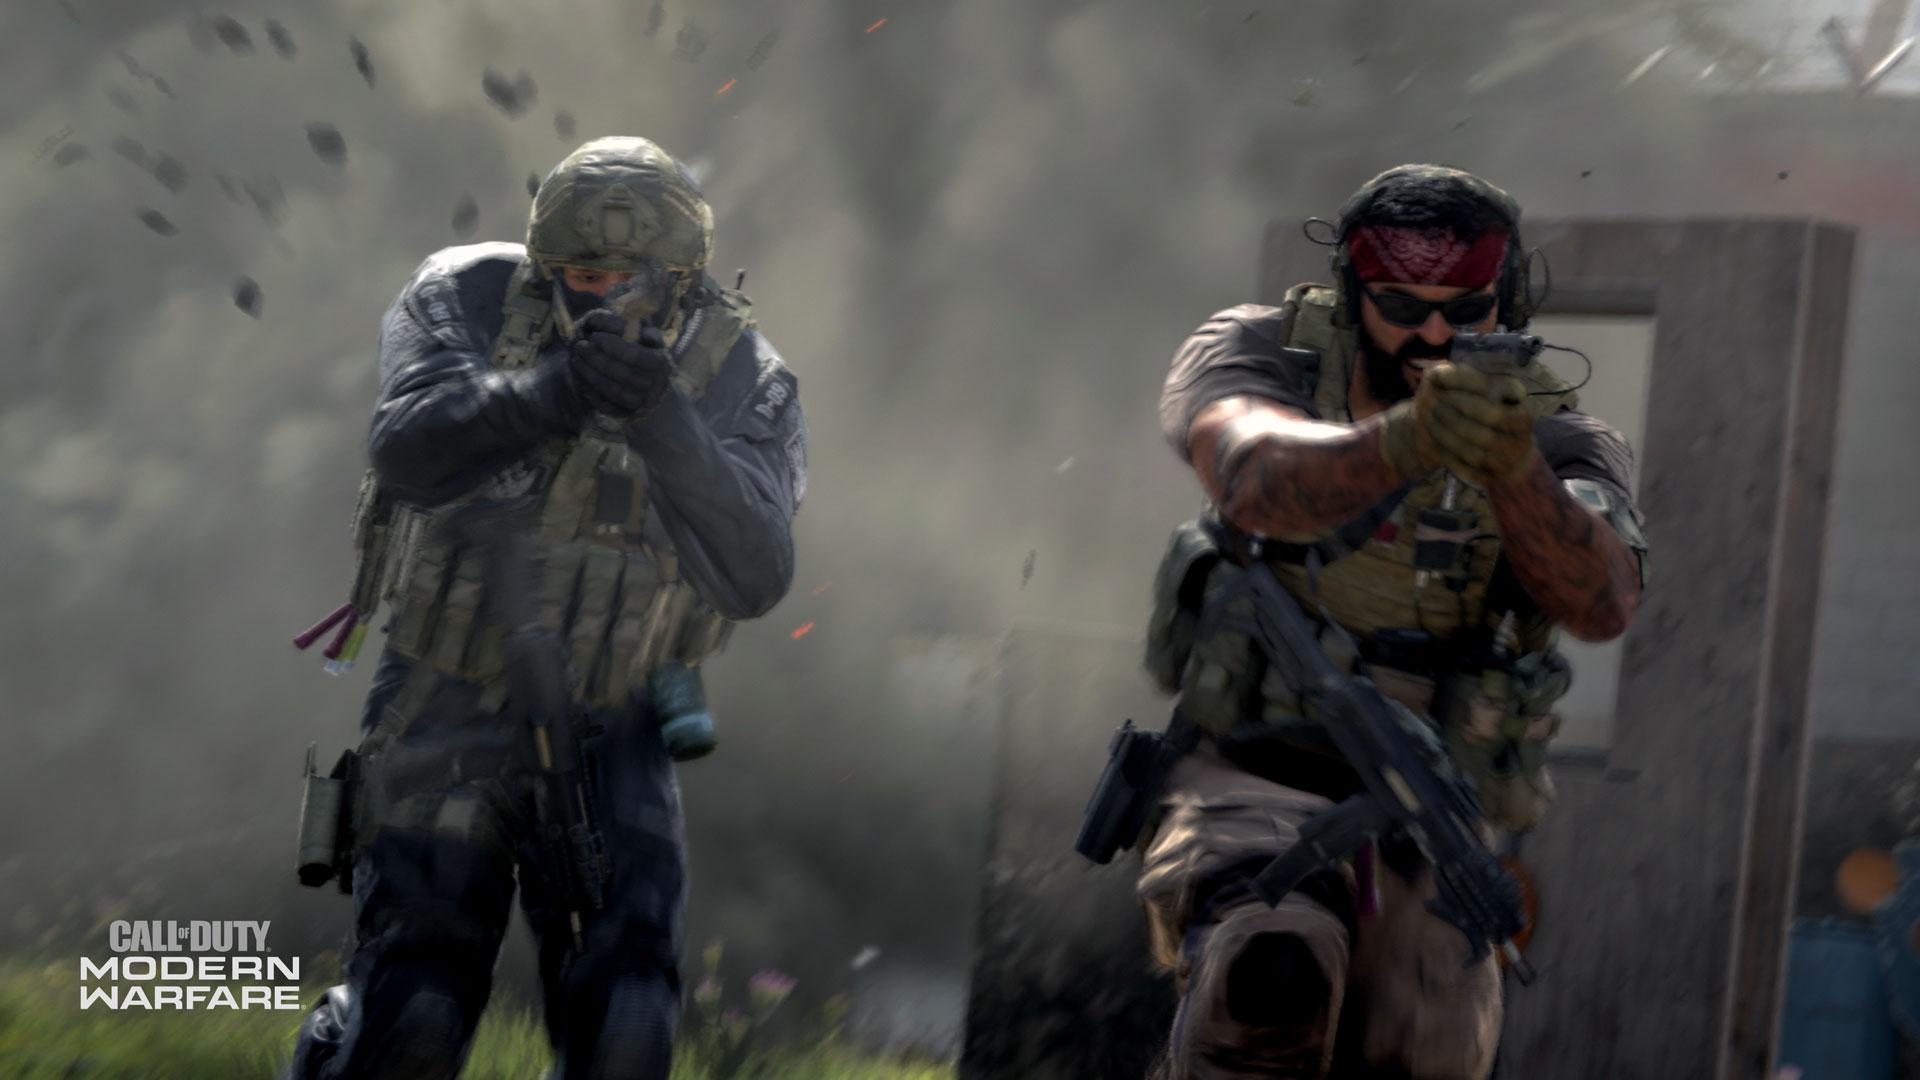 Modern Warfare Pc Beta Psa Make Sure Your Render Resolution Is